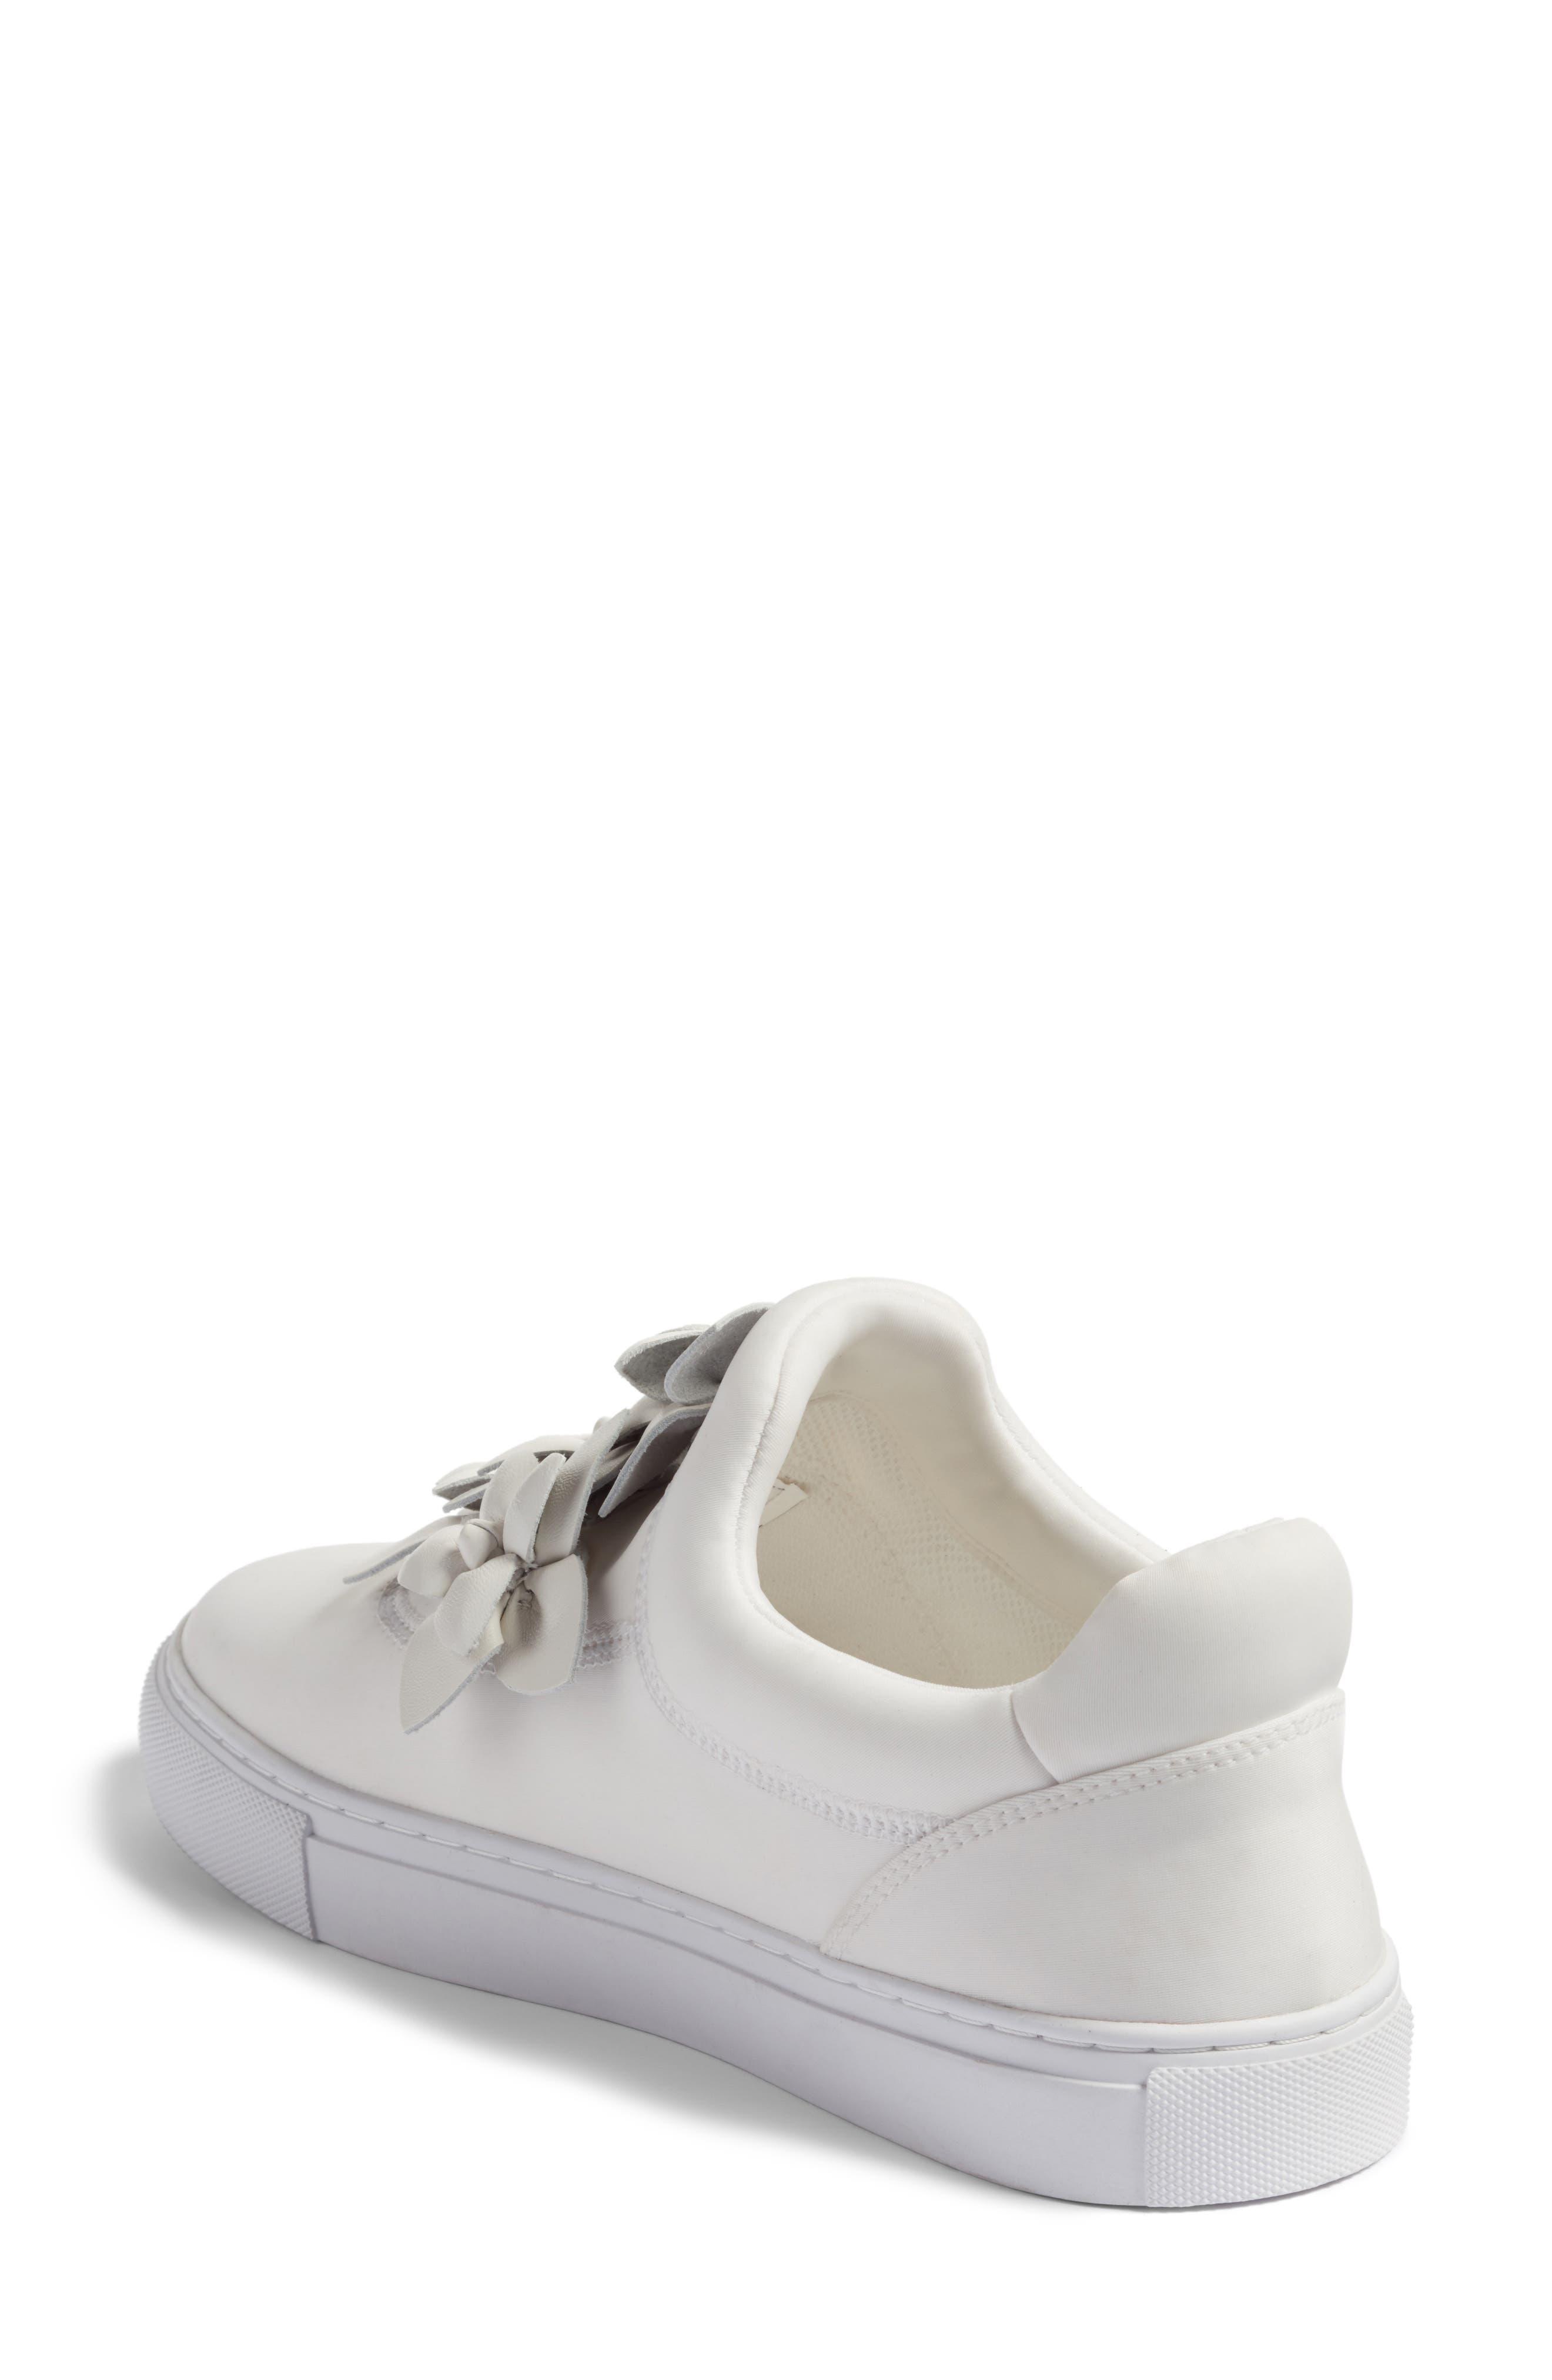 Alternate Image 2  - Tory Burch Blossom Sneaker (Women)